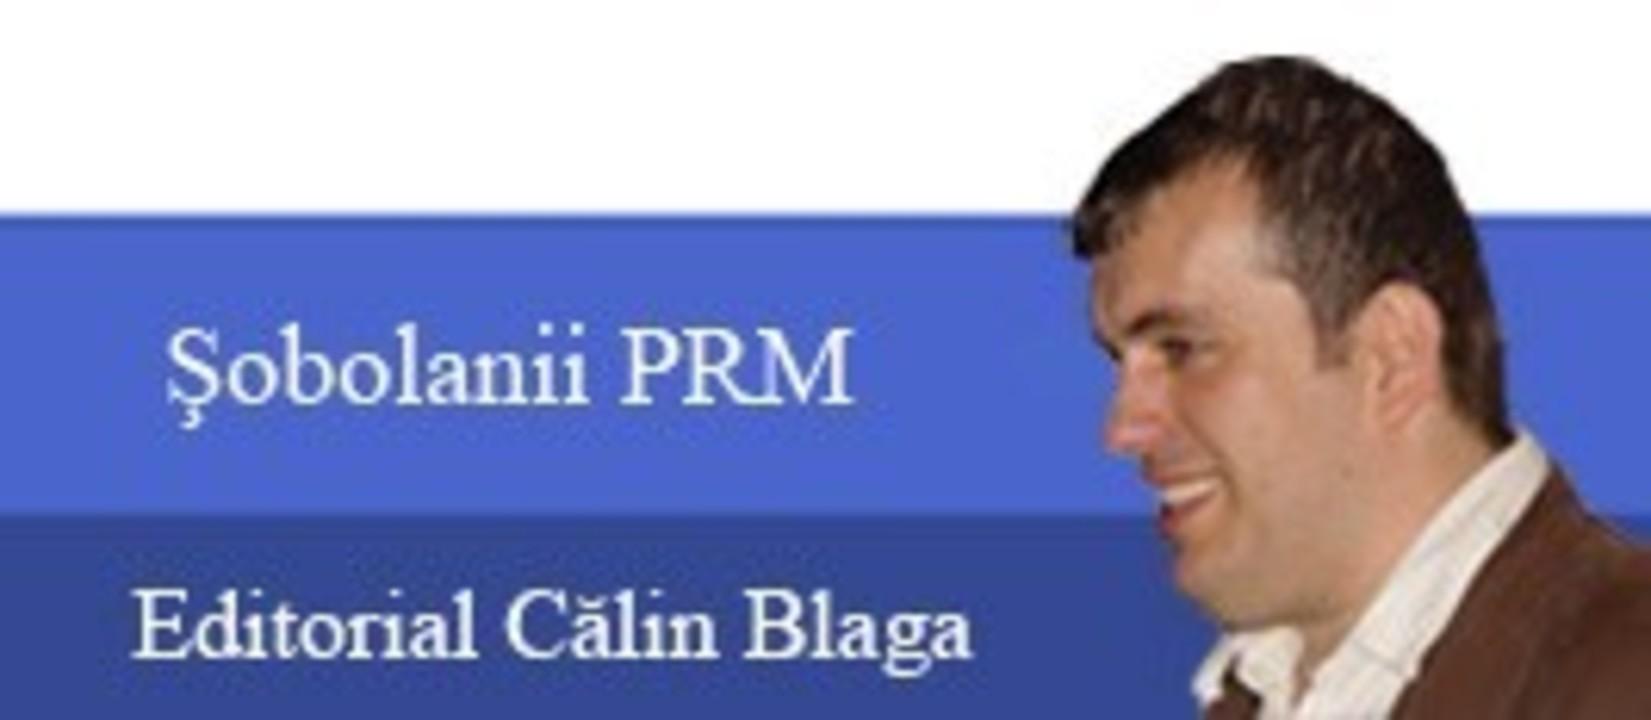 Sobolanii PRM